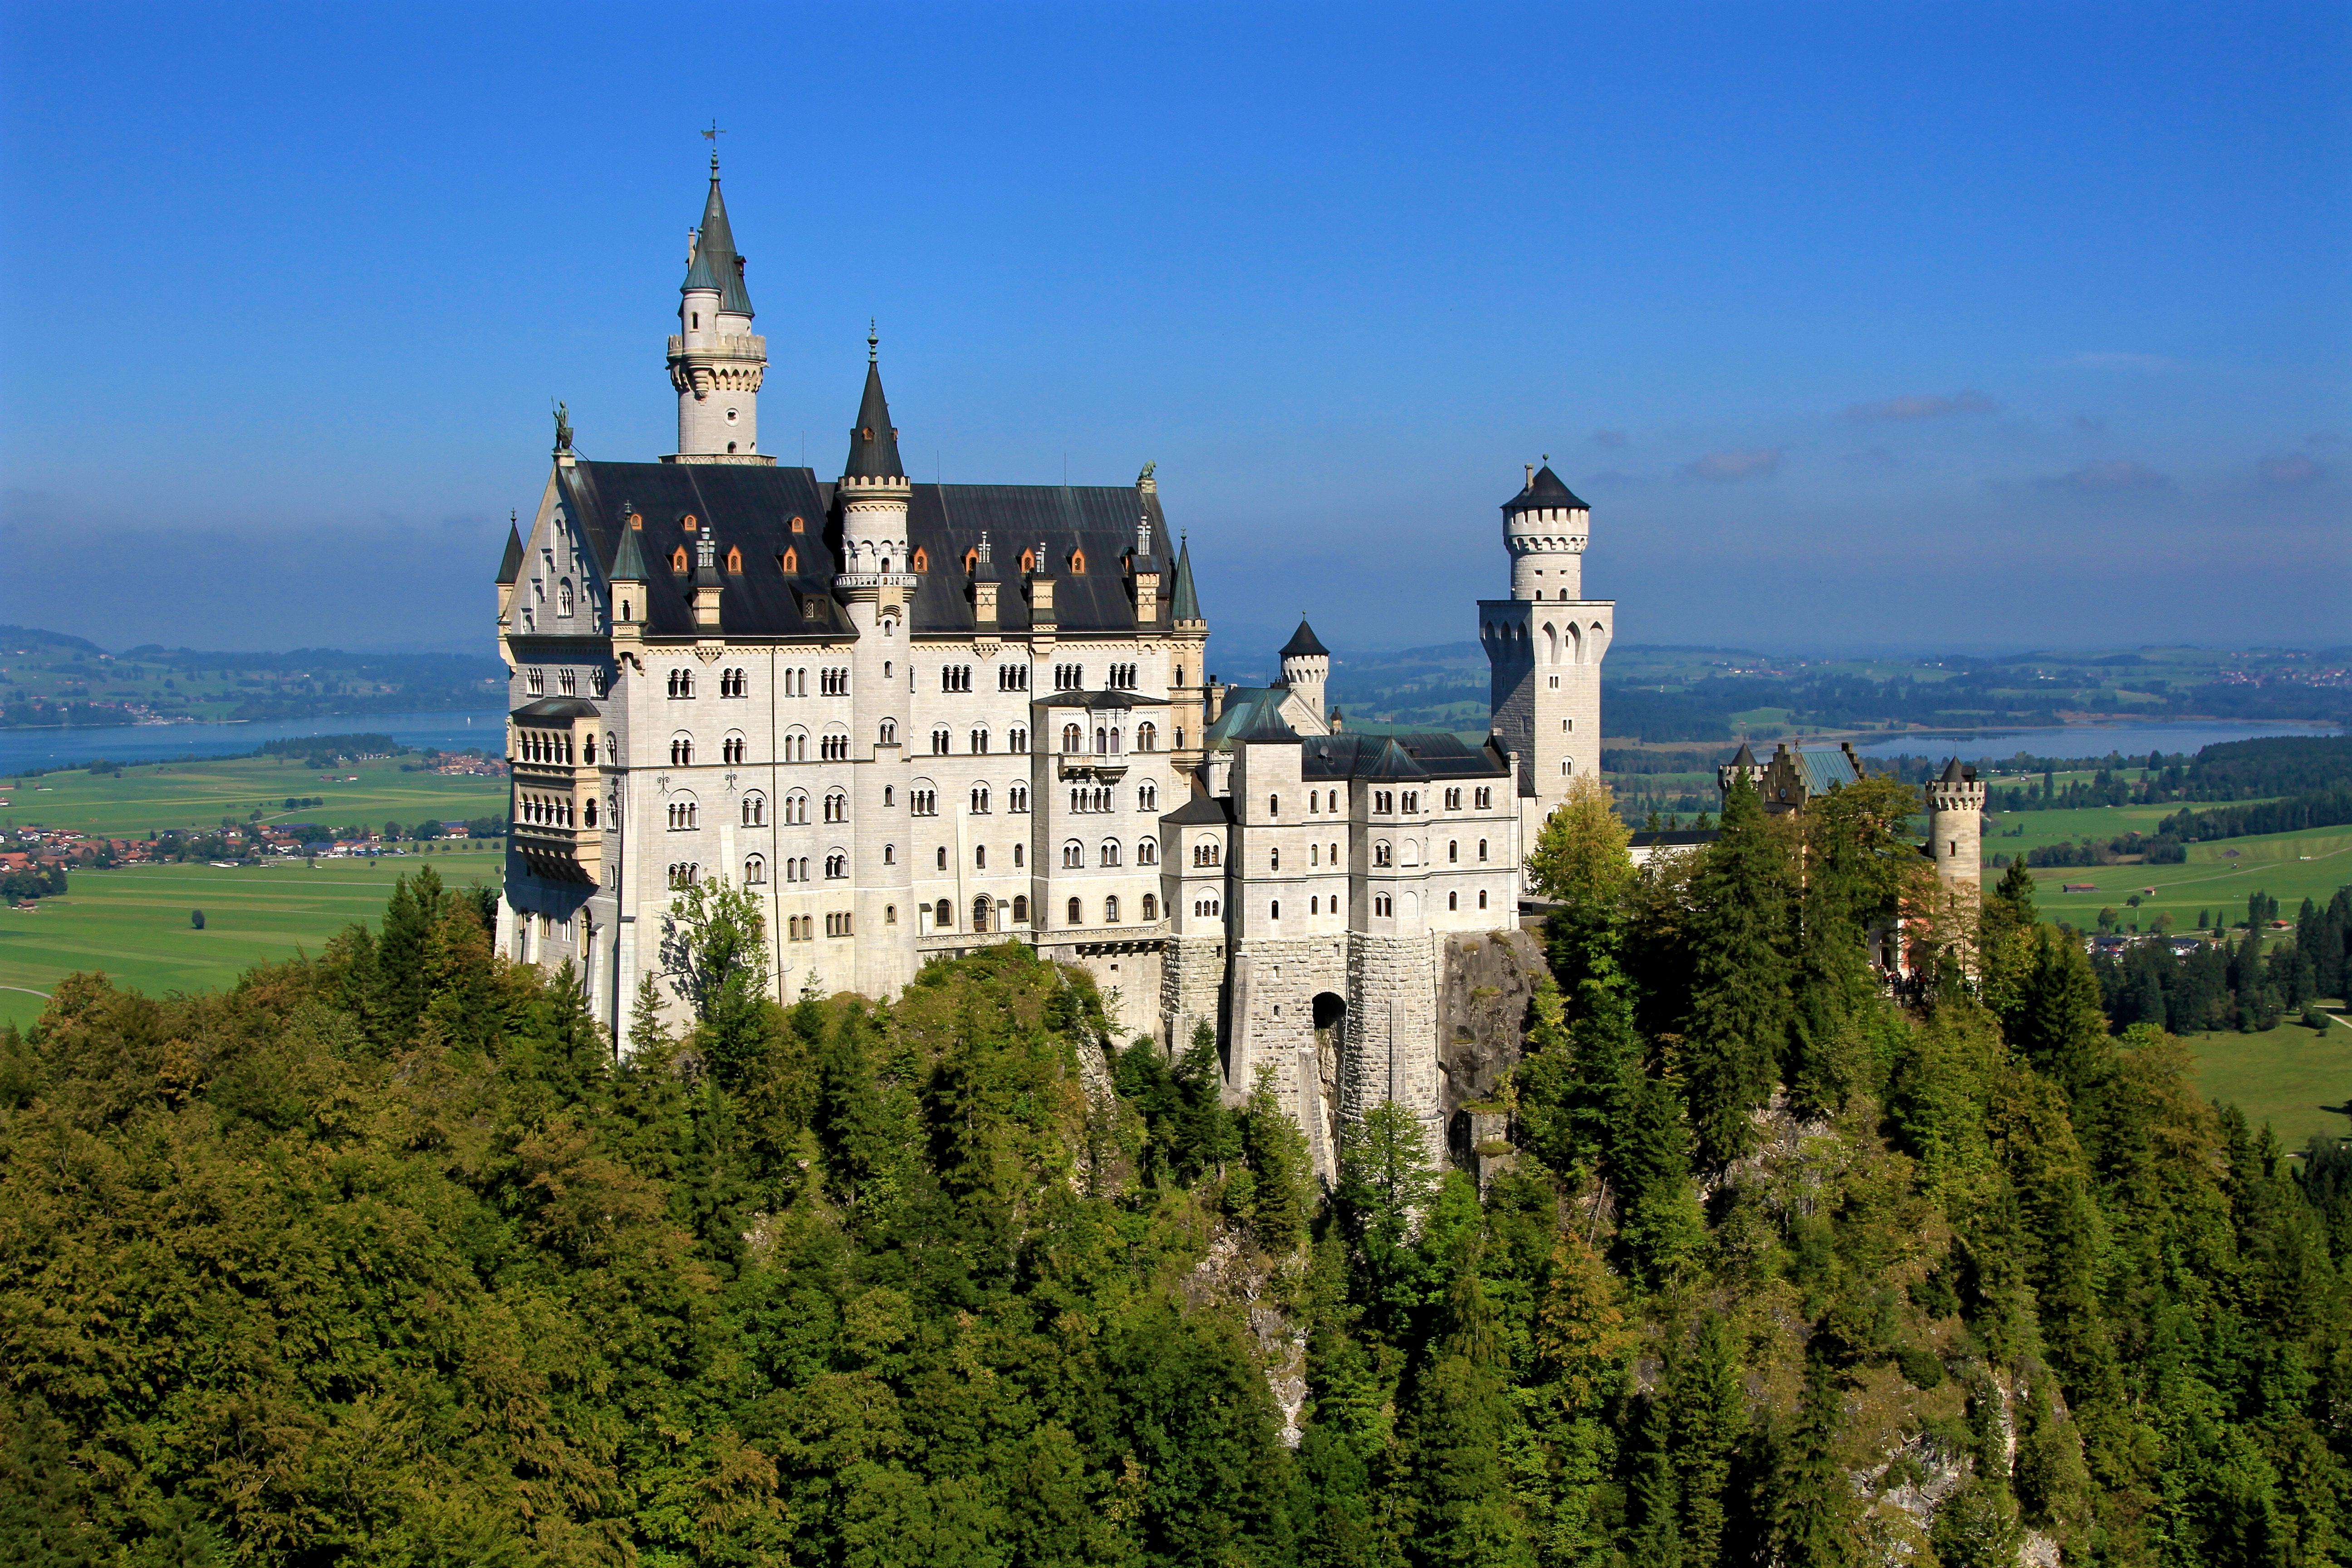 White castle during daytime photo